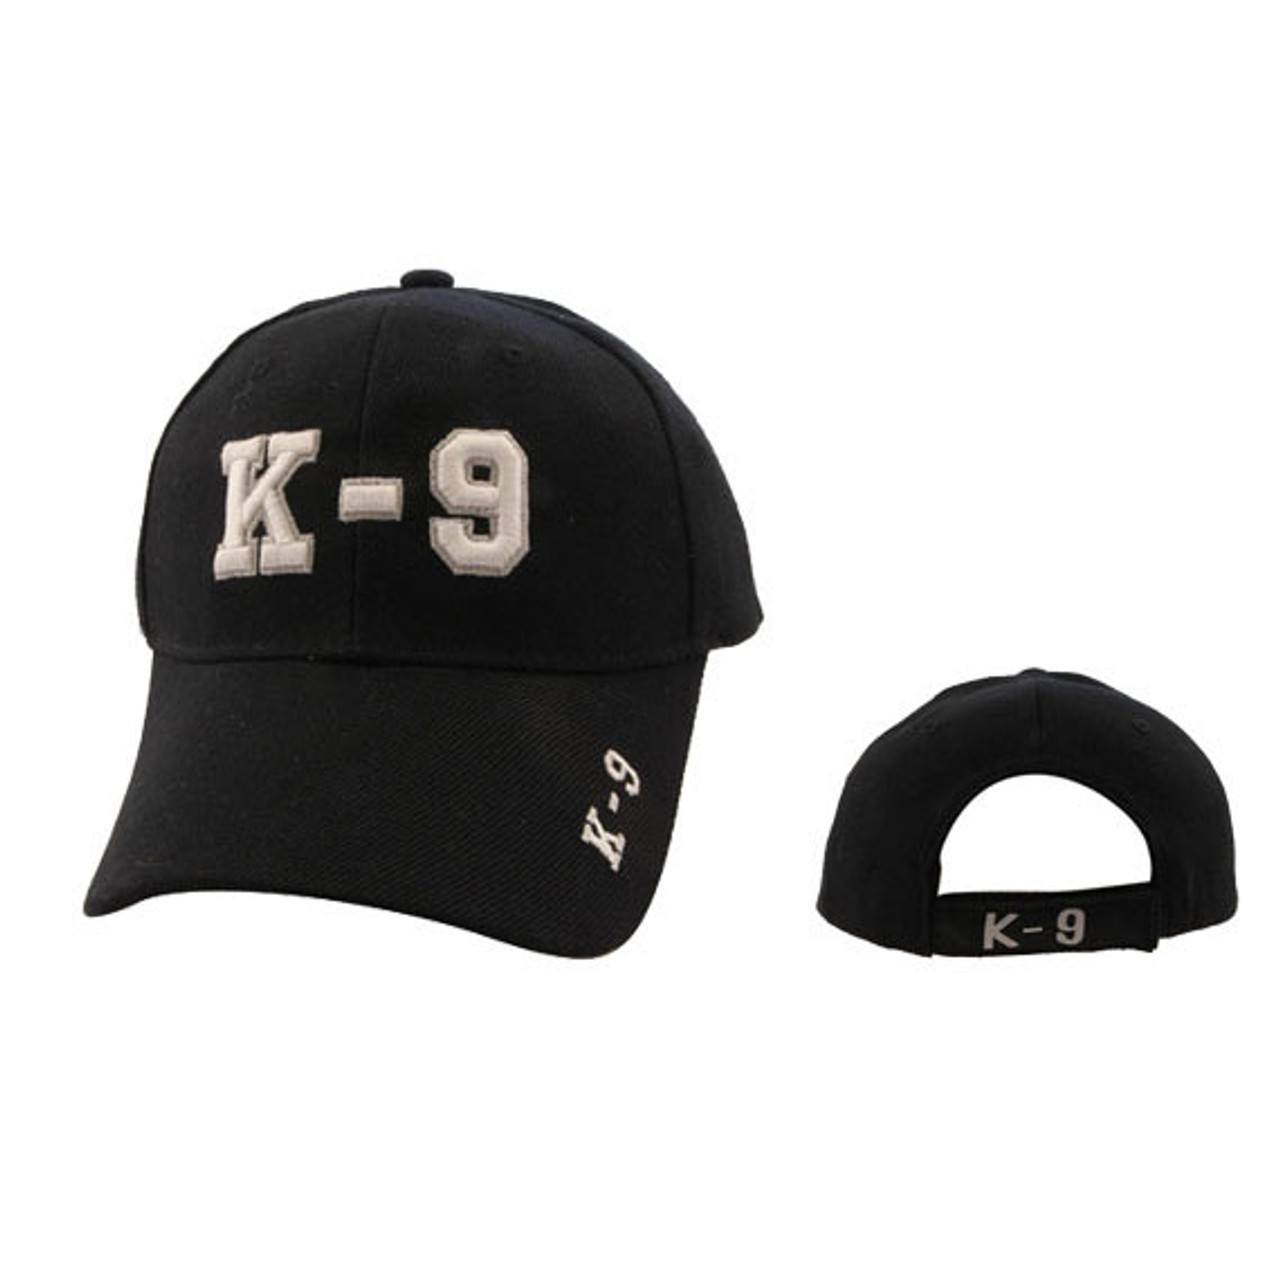 K9 Baseball Cap Wholesale